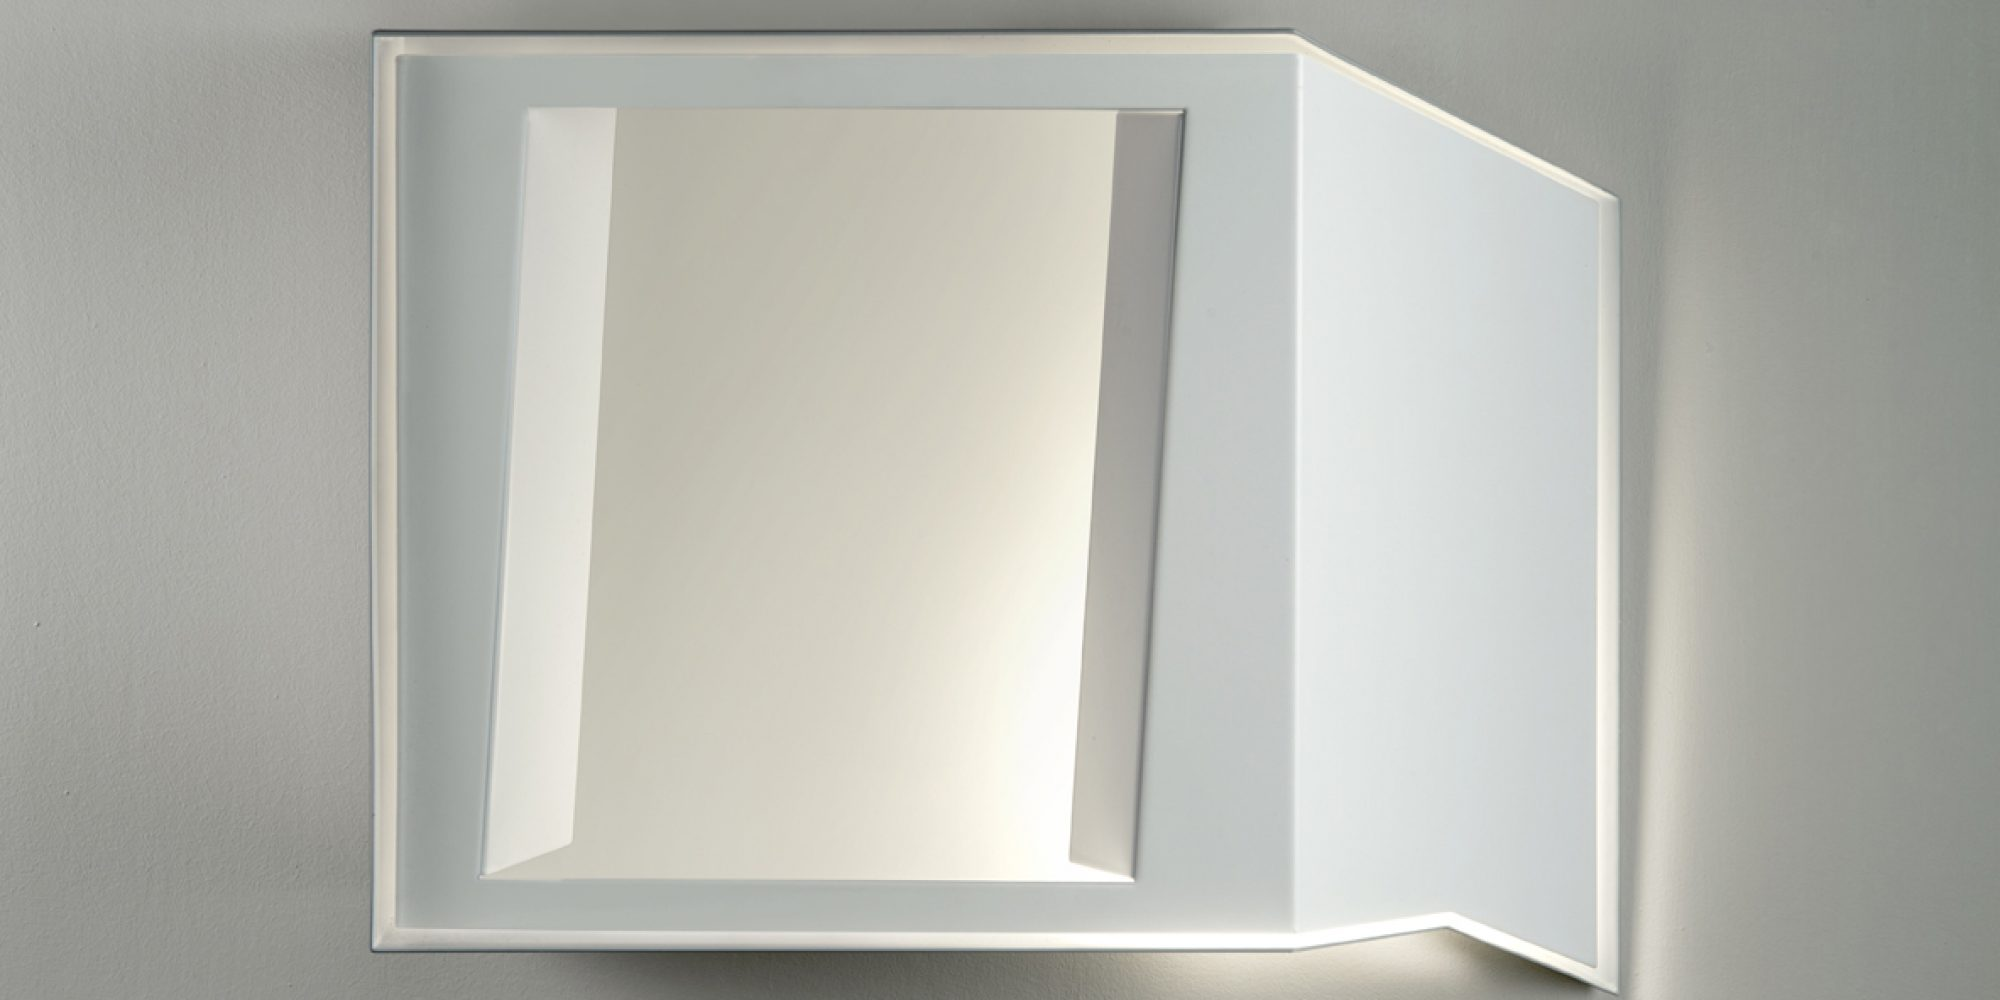 Quadro di Luce isid est 30  design Milena e Stevan Tesic Limited Edition